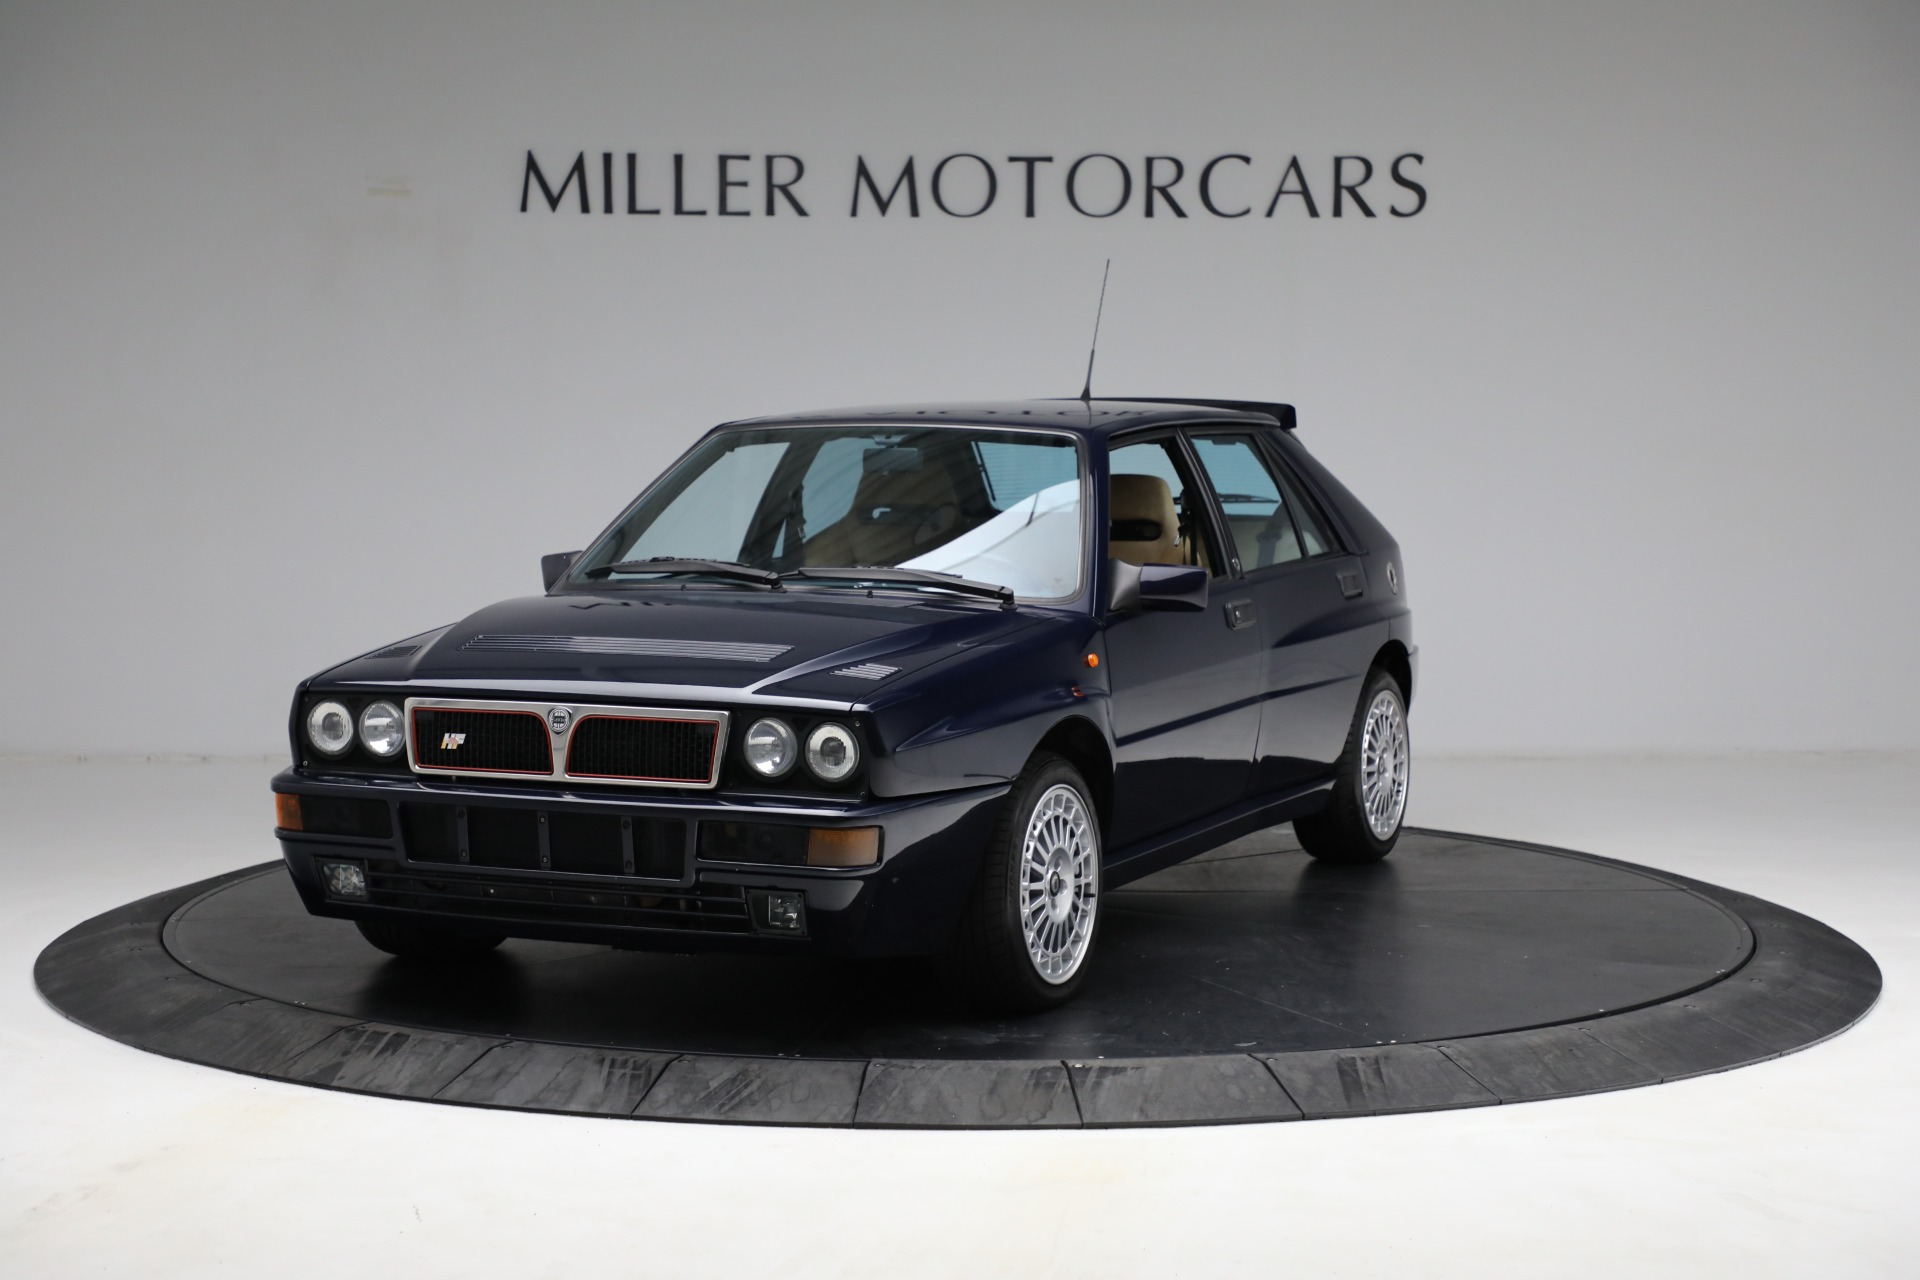 Used 1994 Lancia Delta Integrale Evo II for sale $105,900 at Pagani of Greenwich in Greenwich CT 06830 1